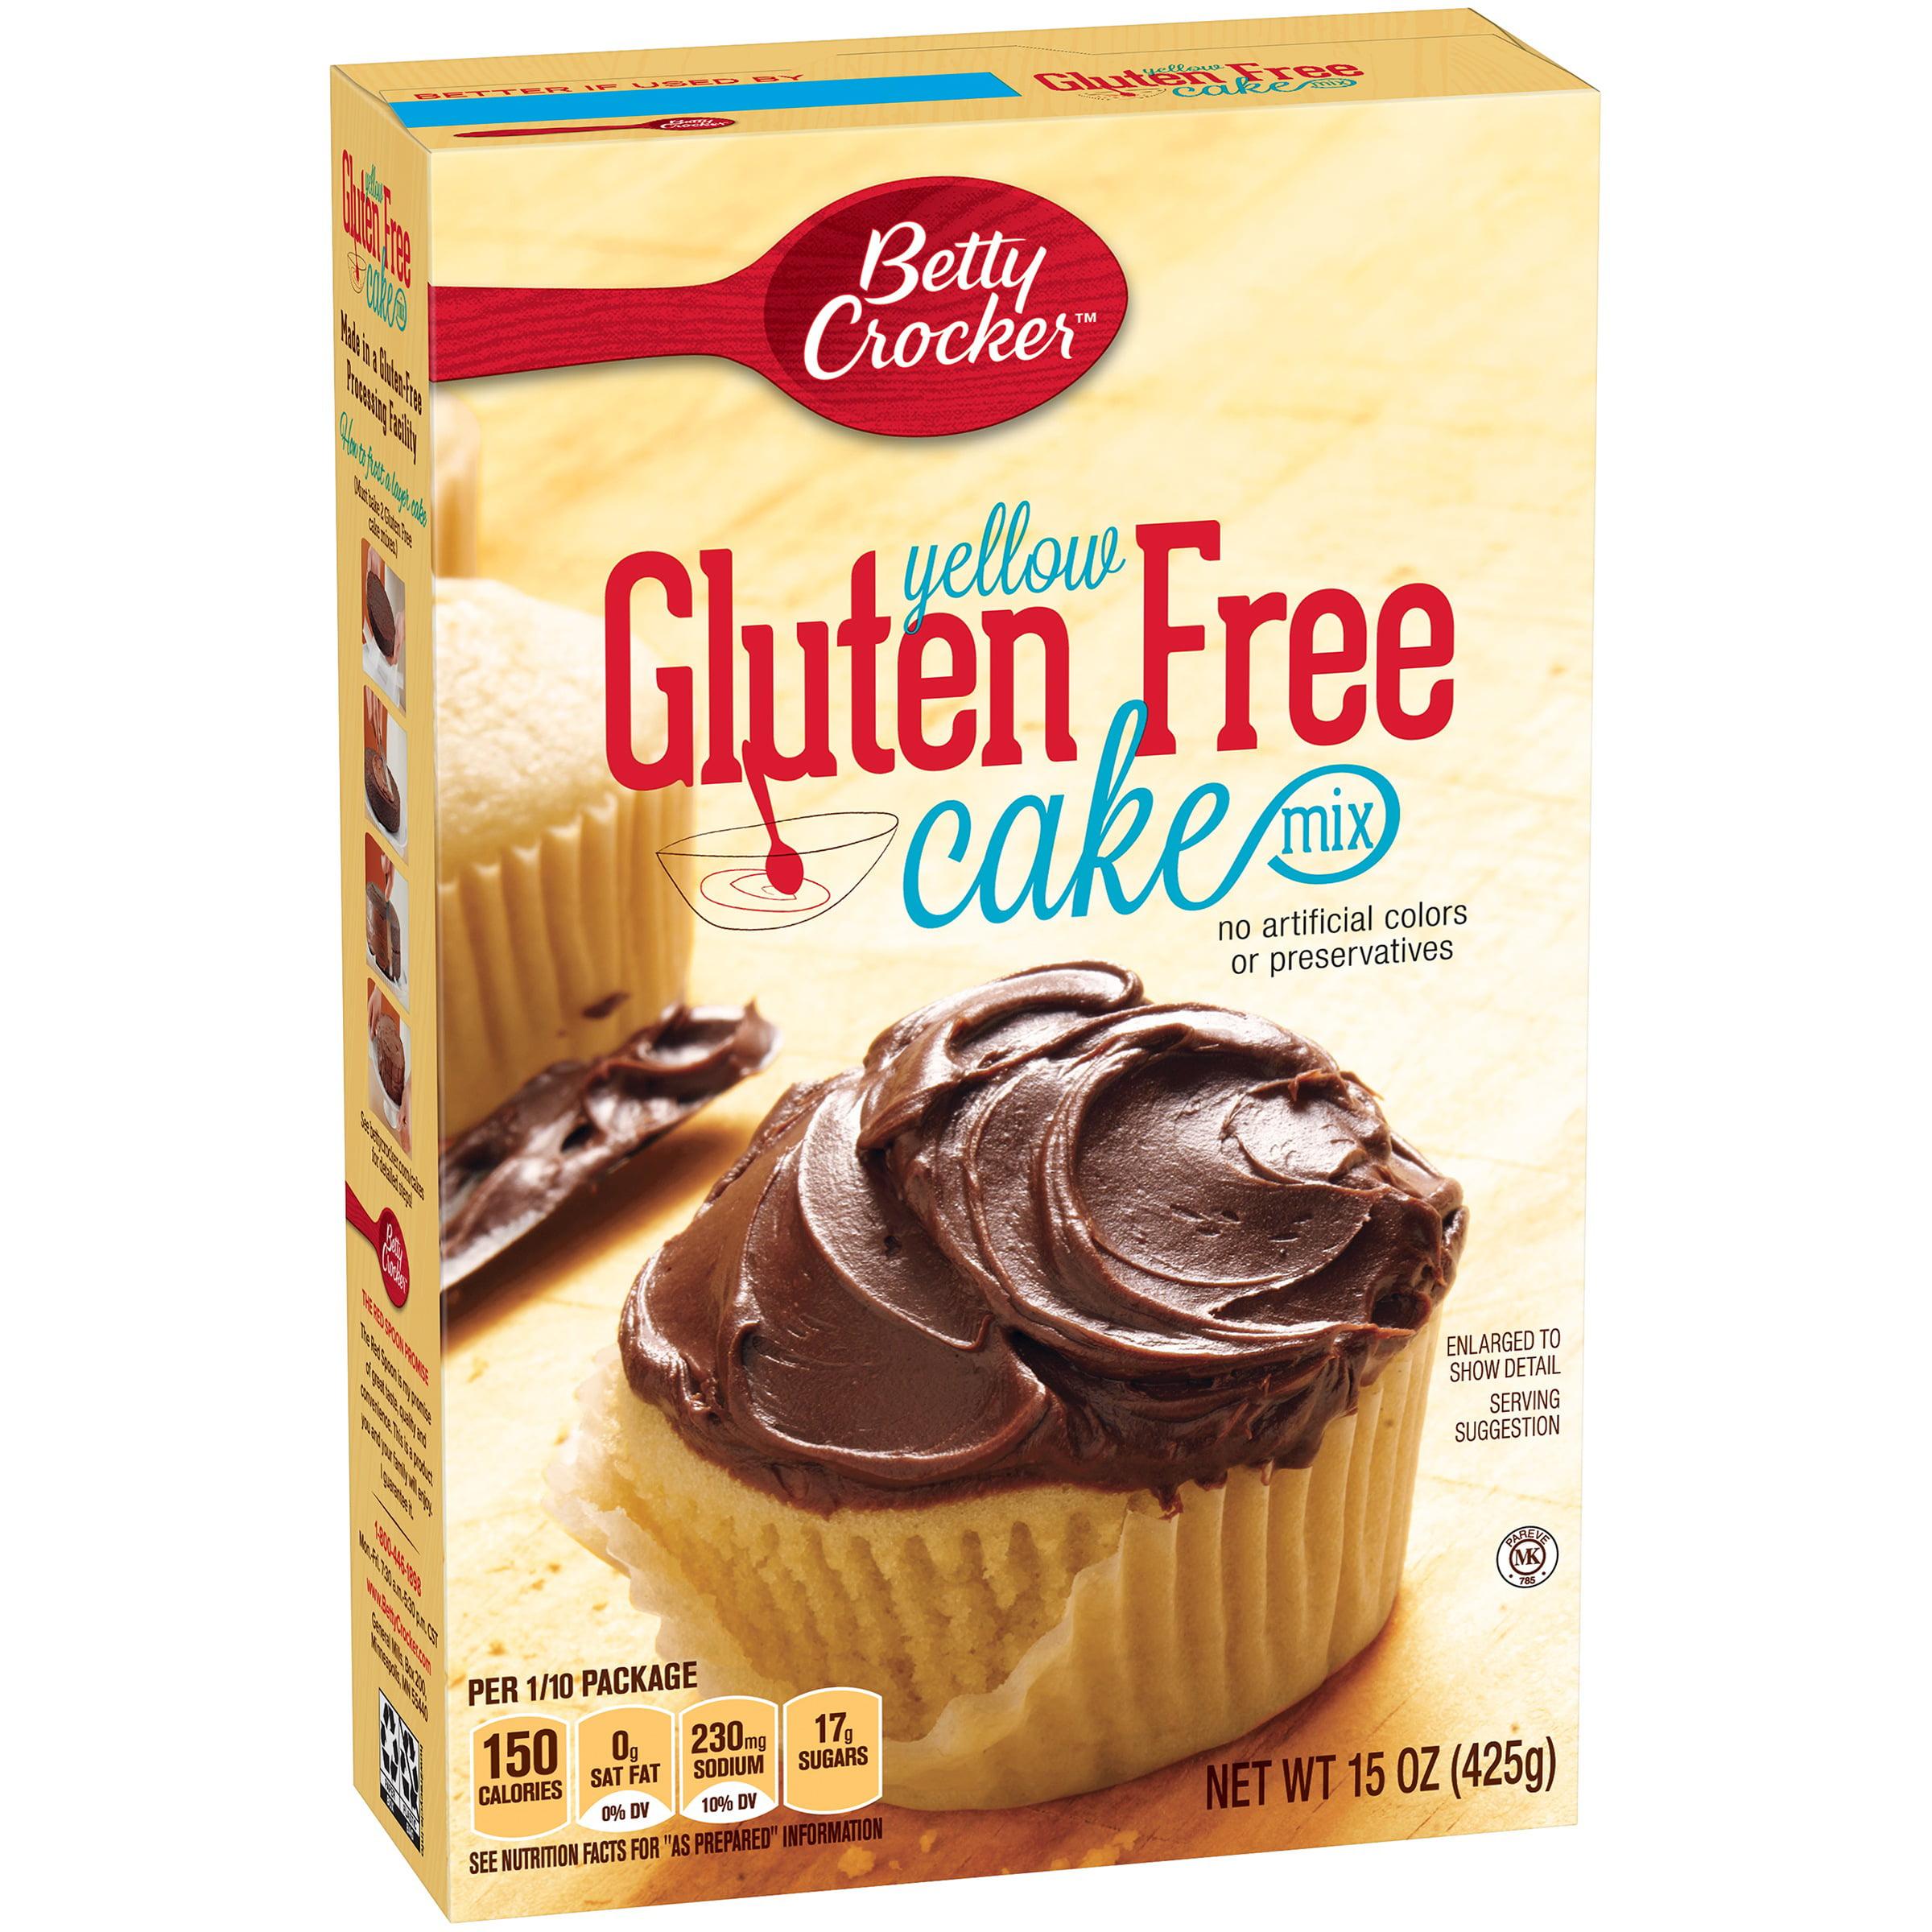 Betty Crocker Gluten Free Cake Mix Yellow 15.0 oz Box, 15.0 OZ by General Mills Sales, Inc.